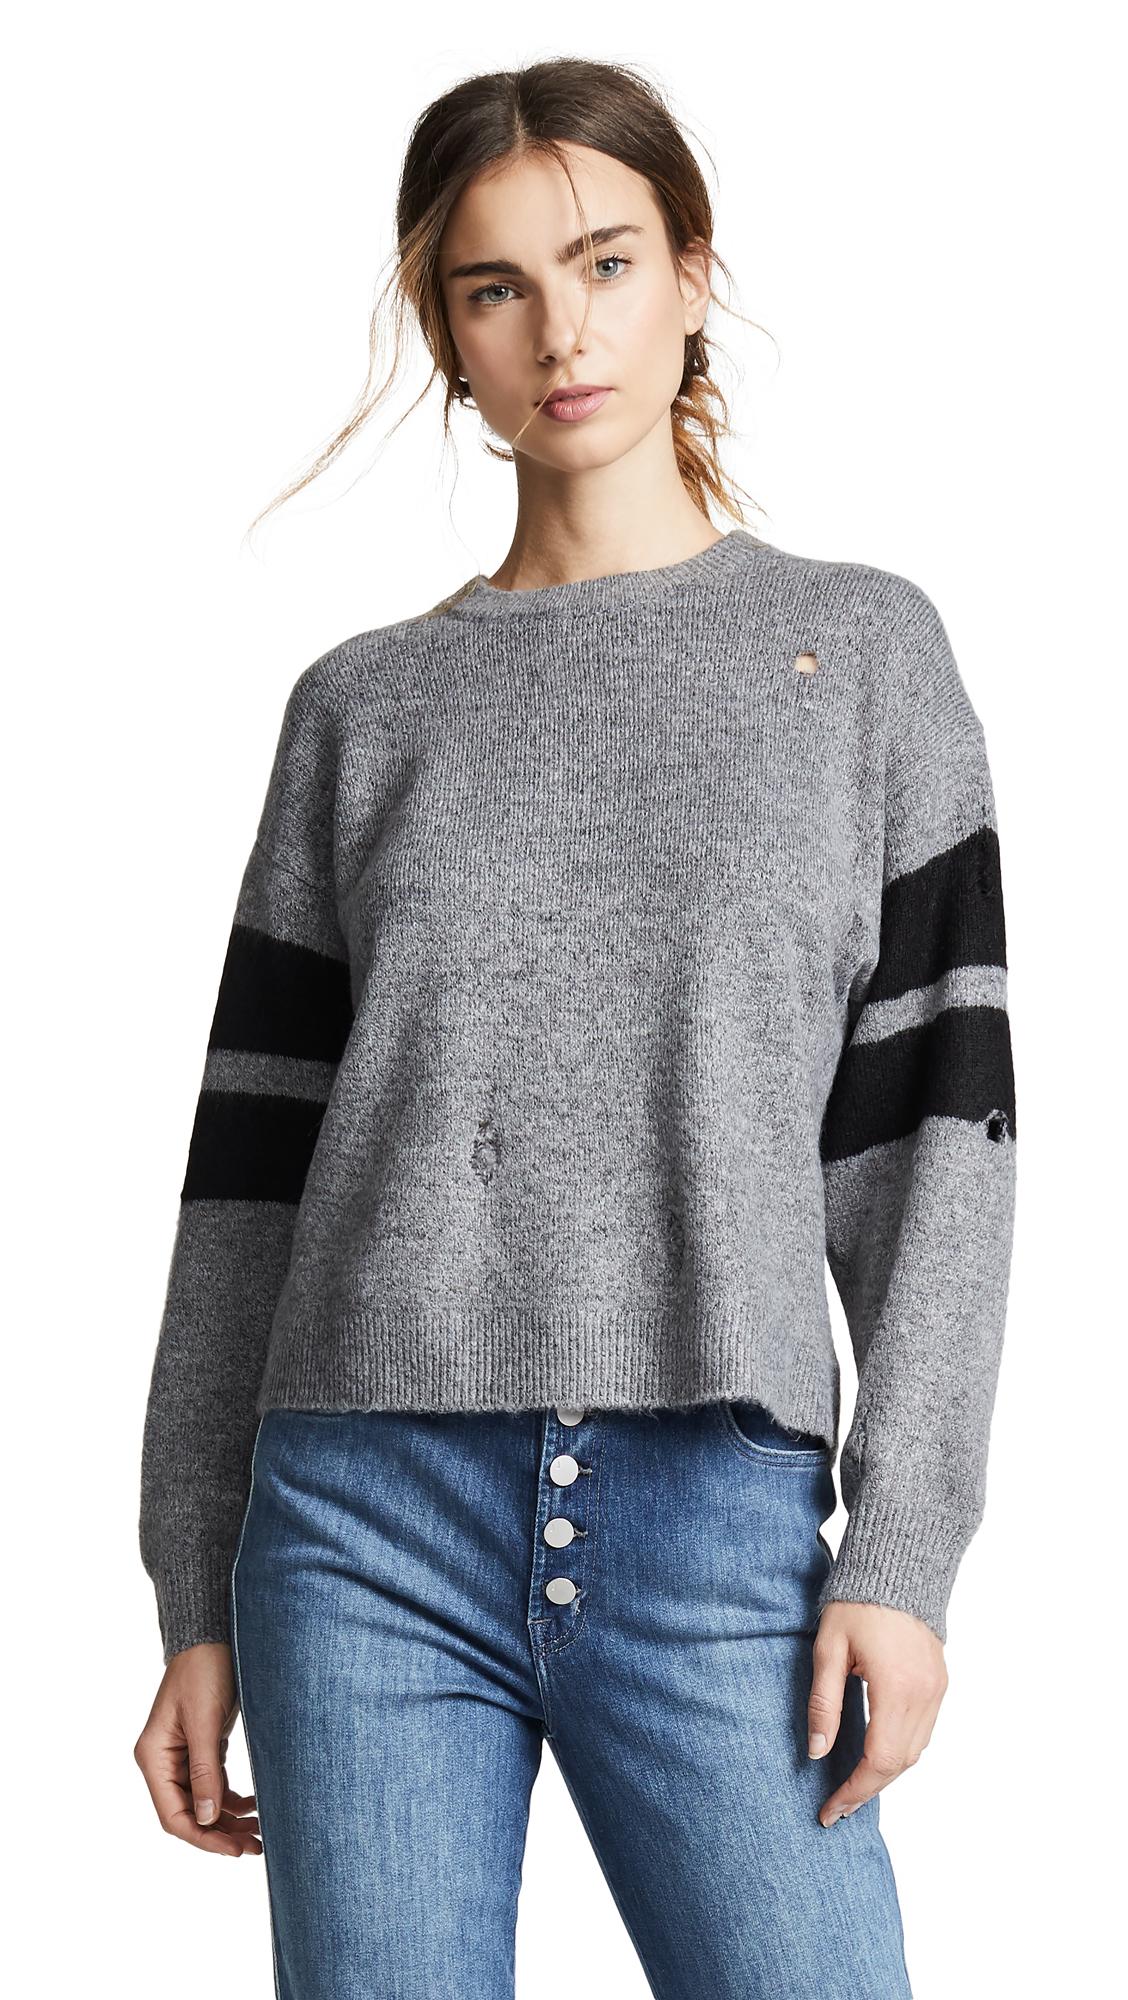 Yates Sweater in Gray